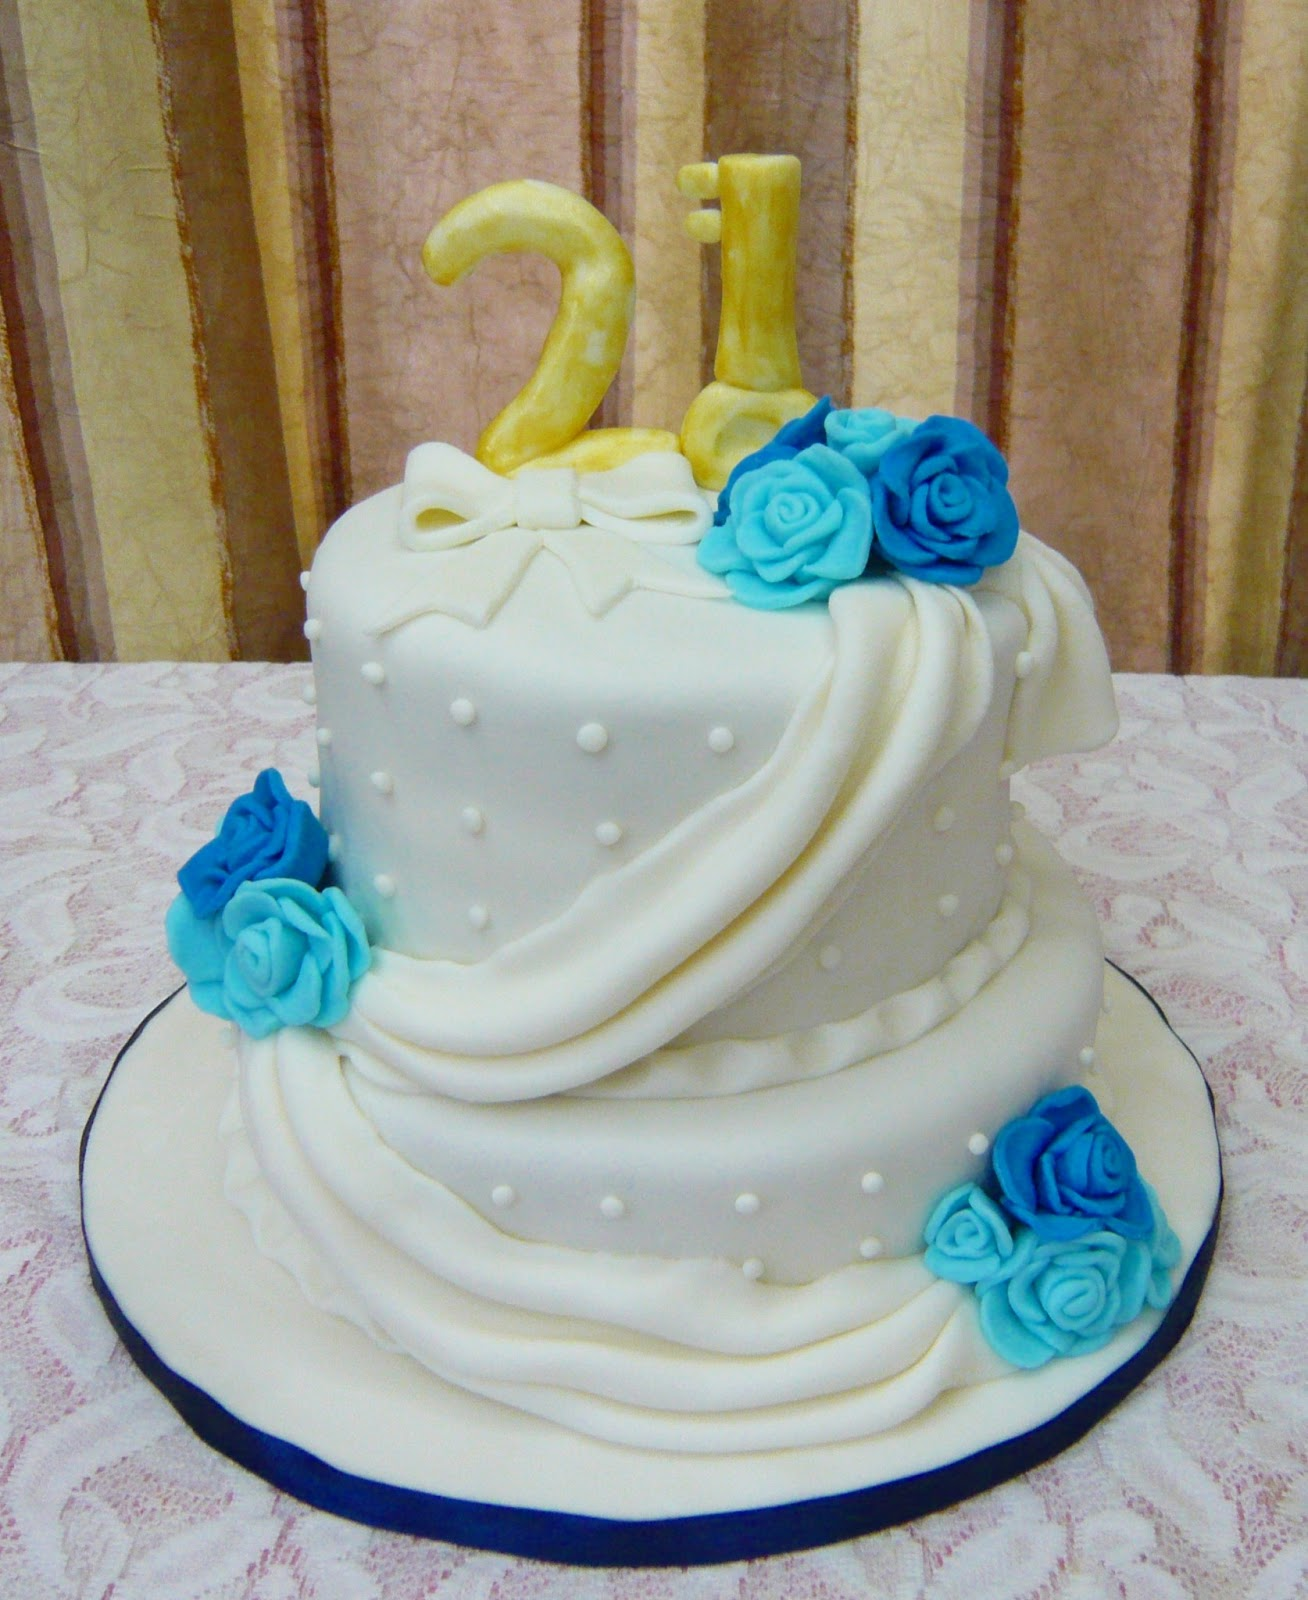 Jenn Cupcakes Muffins 2 Tier 21st Birthday Cake